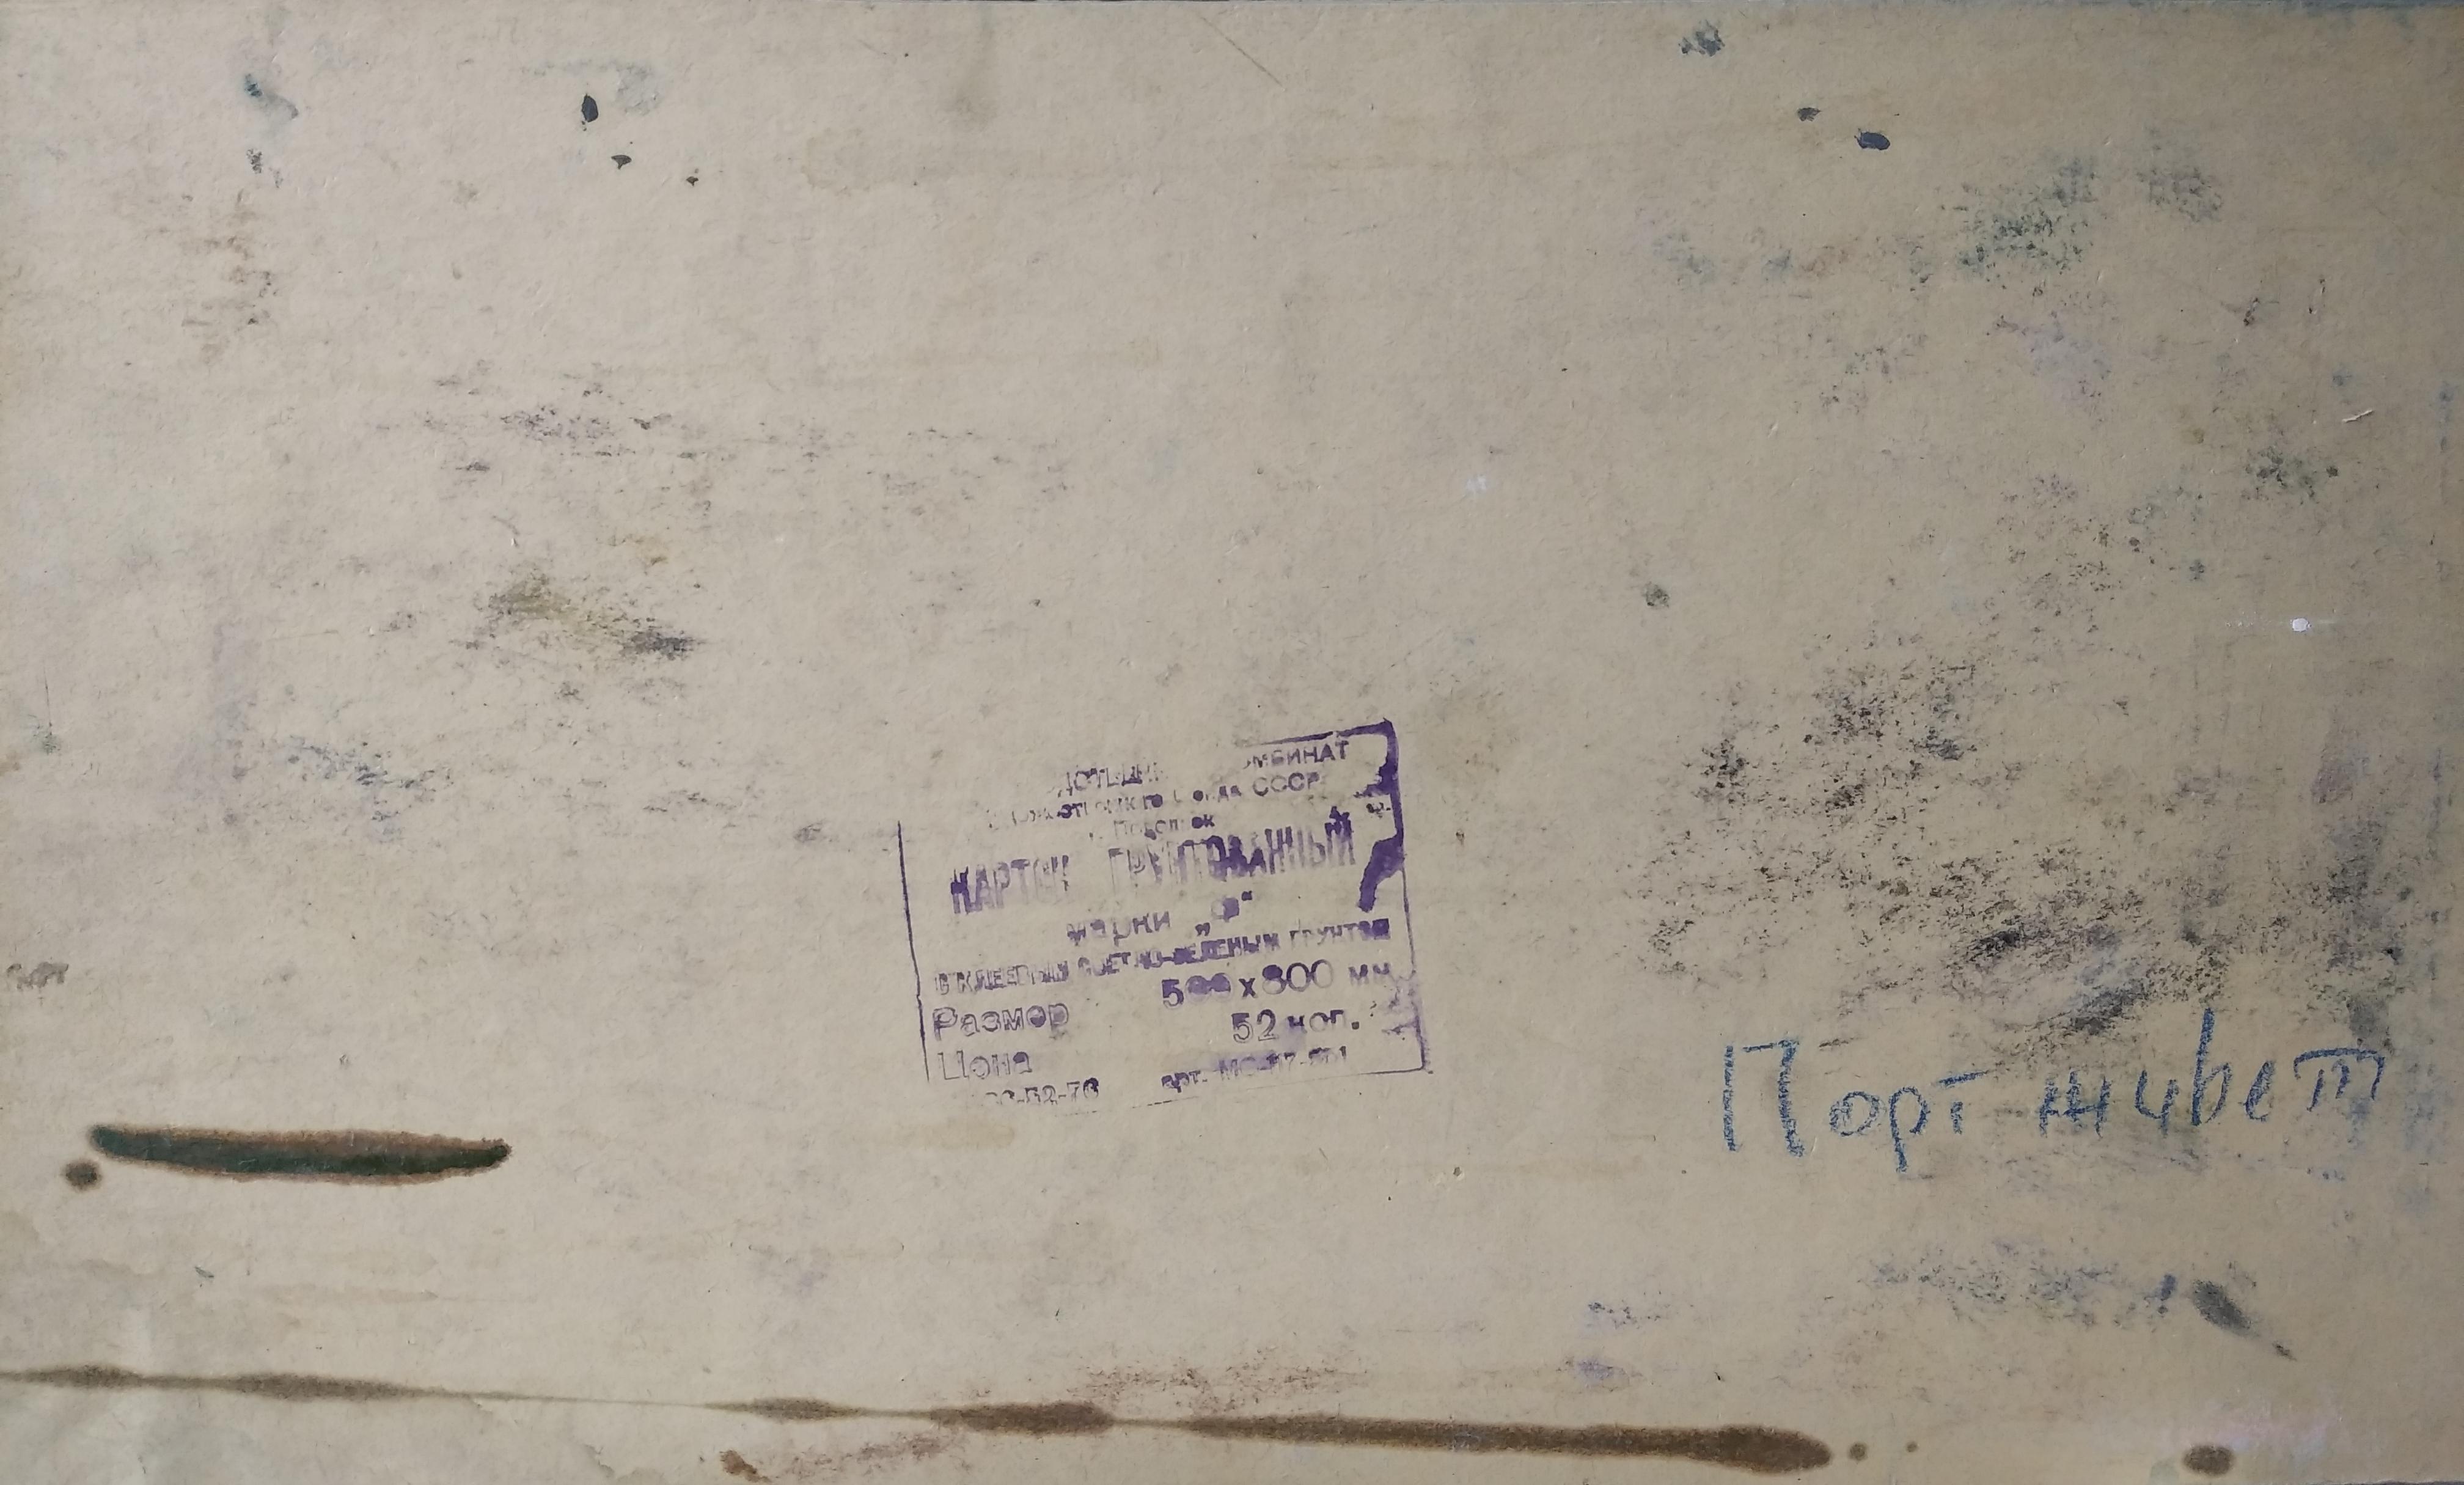 Порт живет 25-50 см., картон, масло 1982 год  - 1